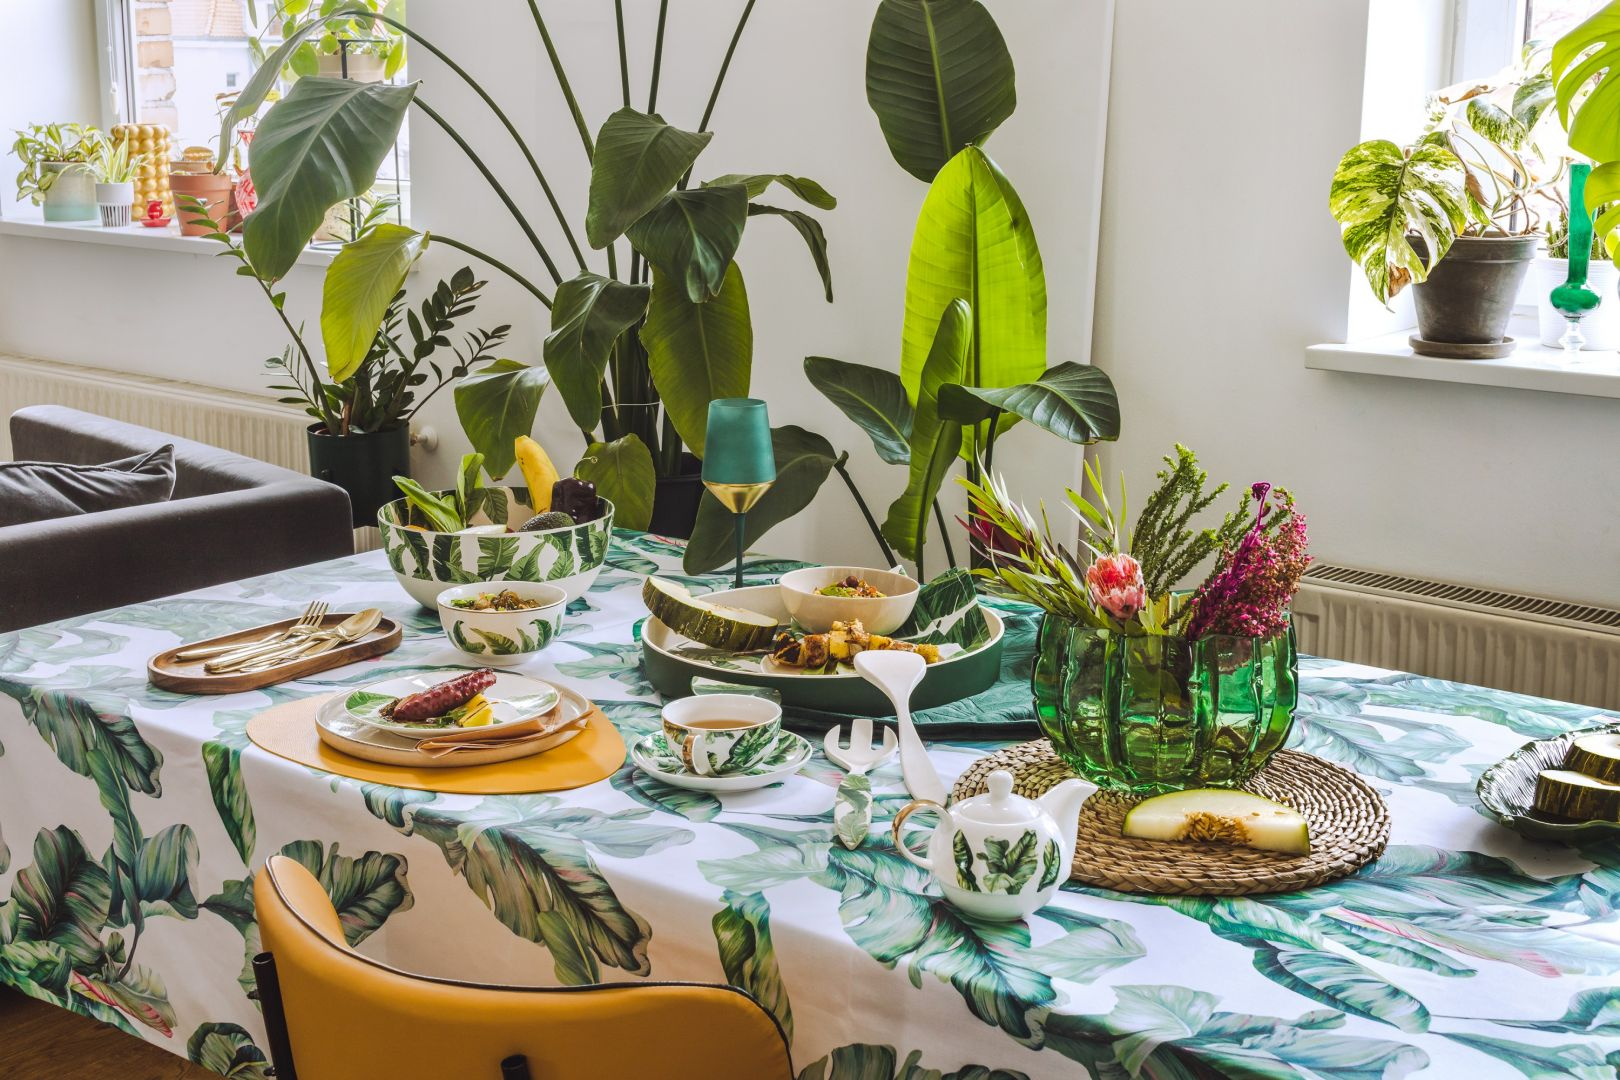 Rośliny w mieszkaniu Fot. Home & You